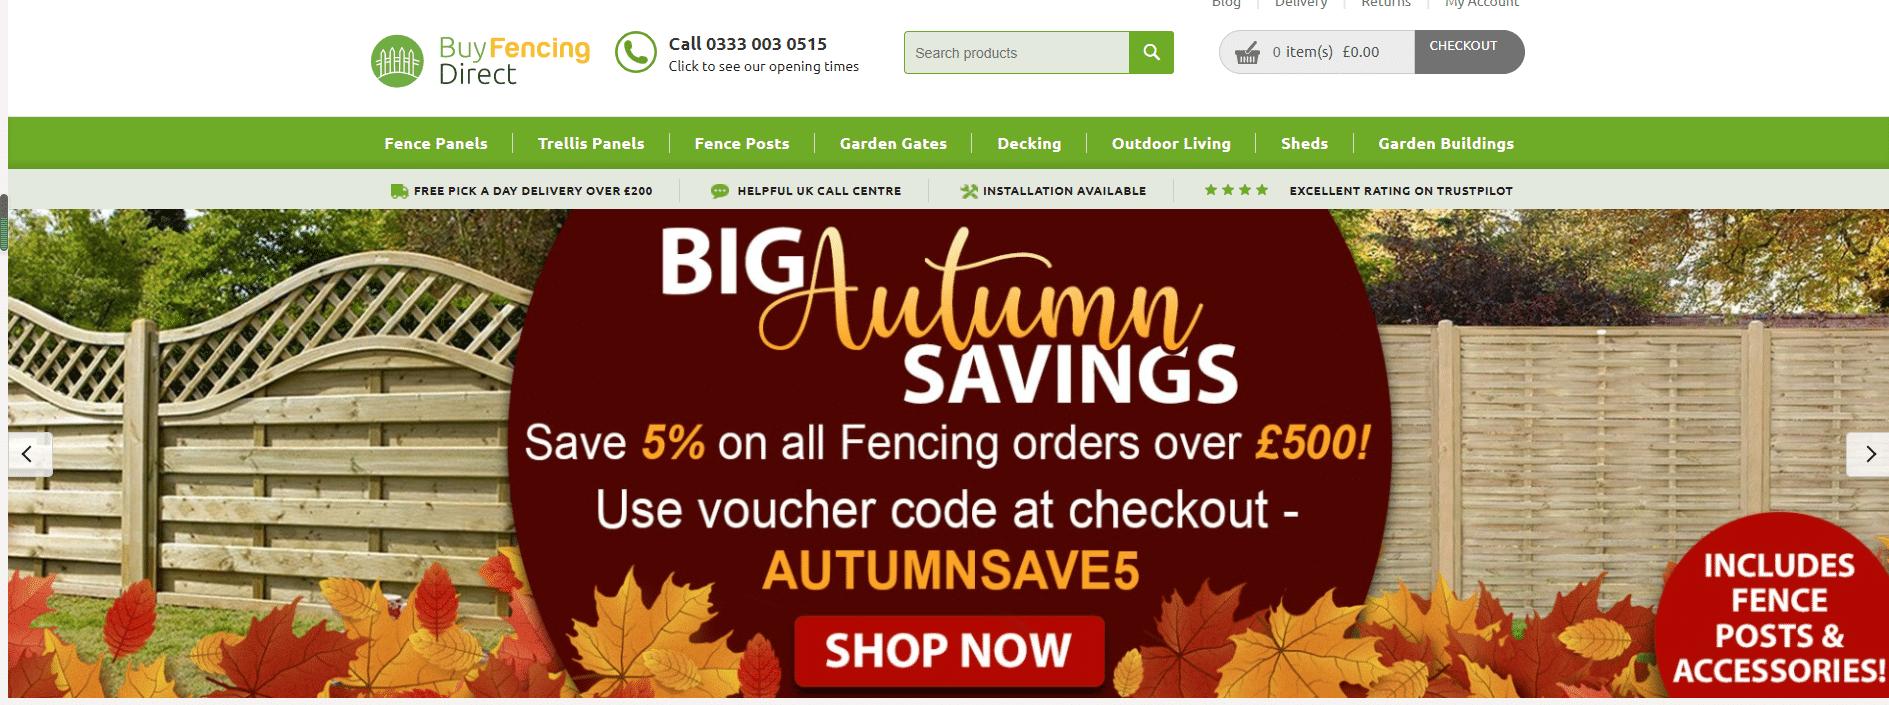 5% OFF Buy Fencing Direct Discount Code